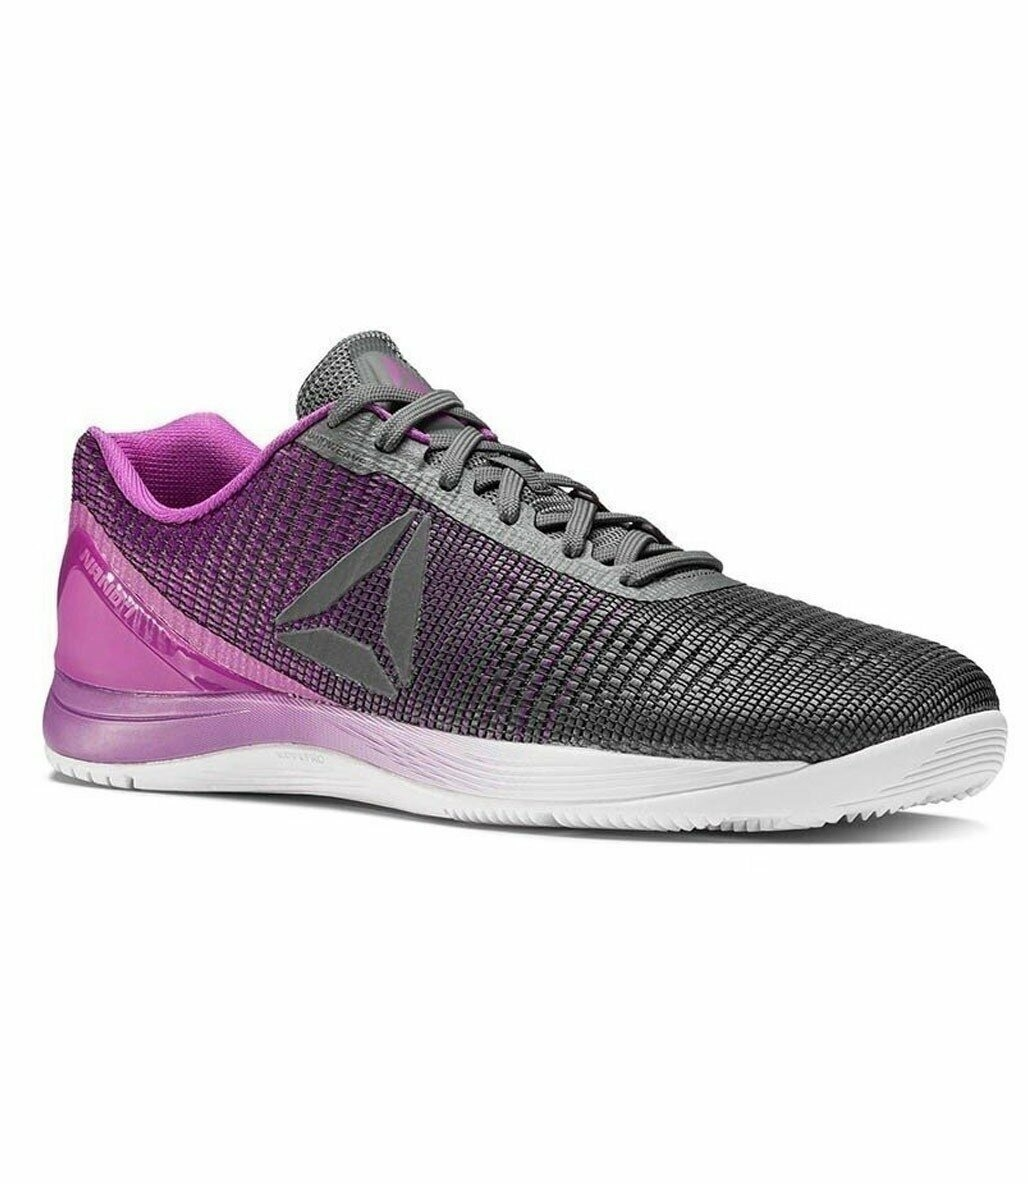 Reebok R Crossfit Nano 7.0 Bayan Spor Ayakkabısı